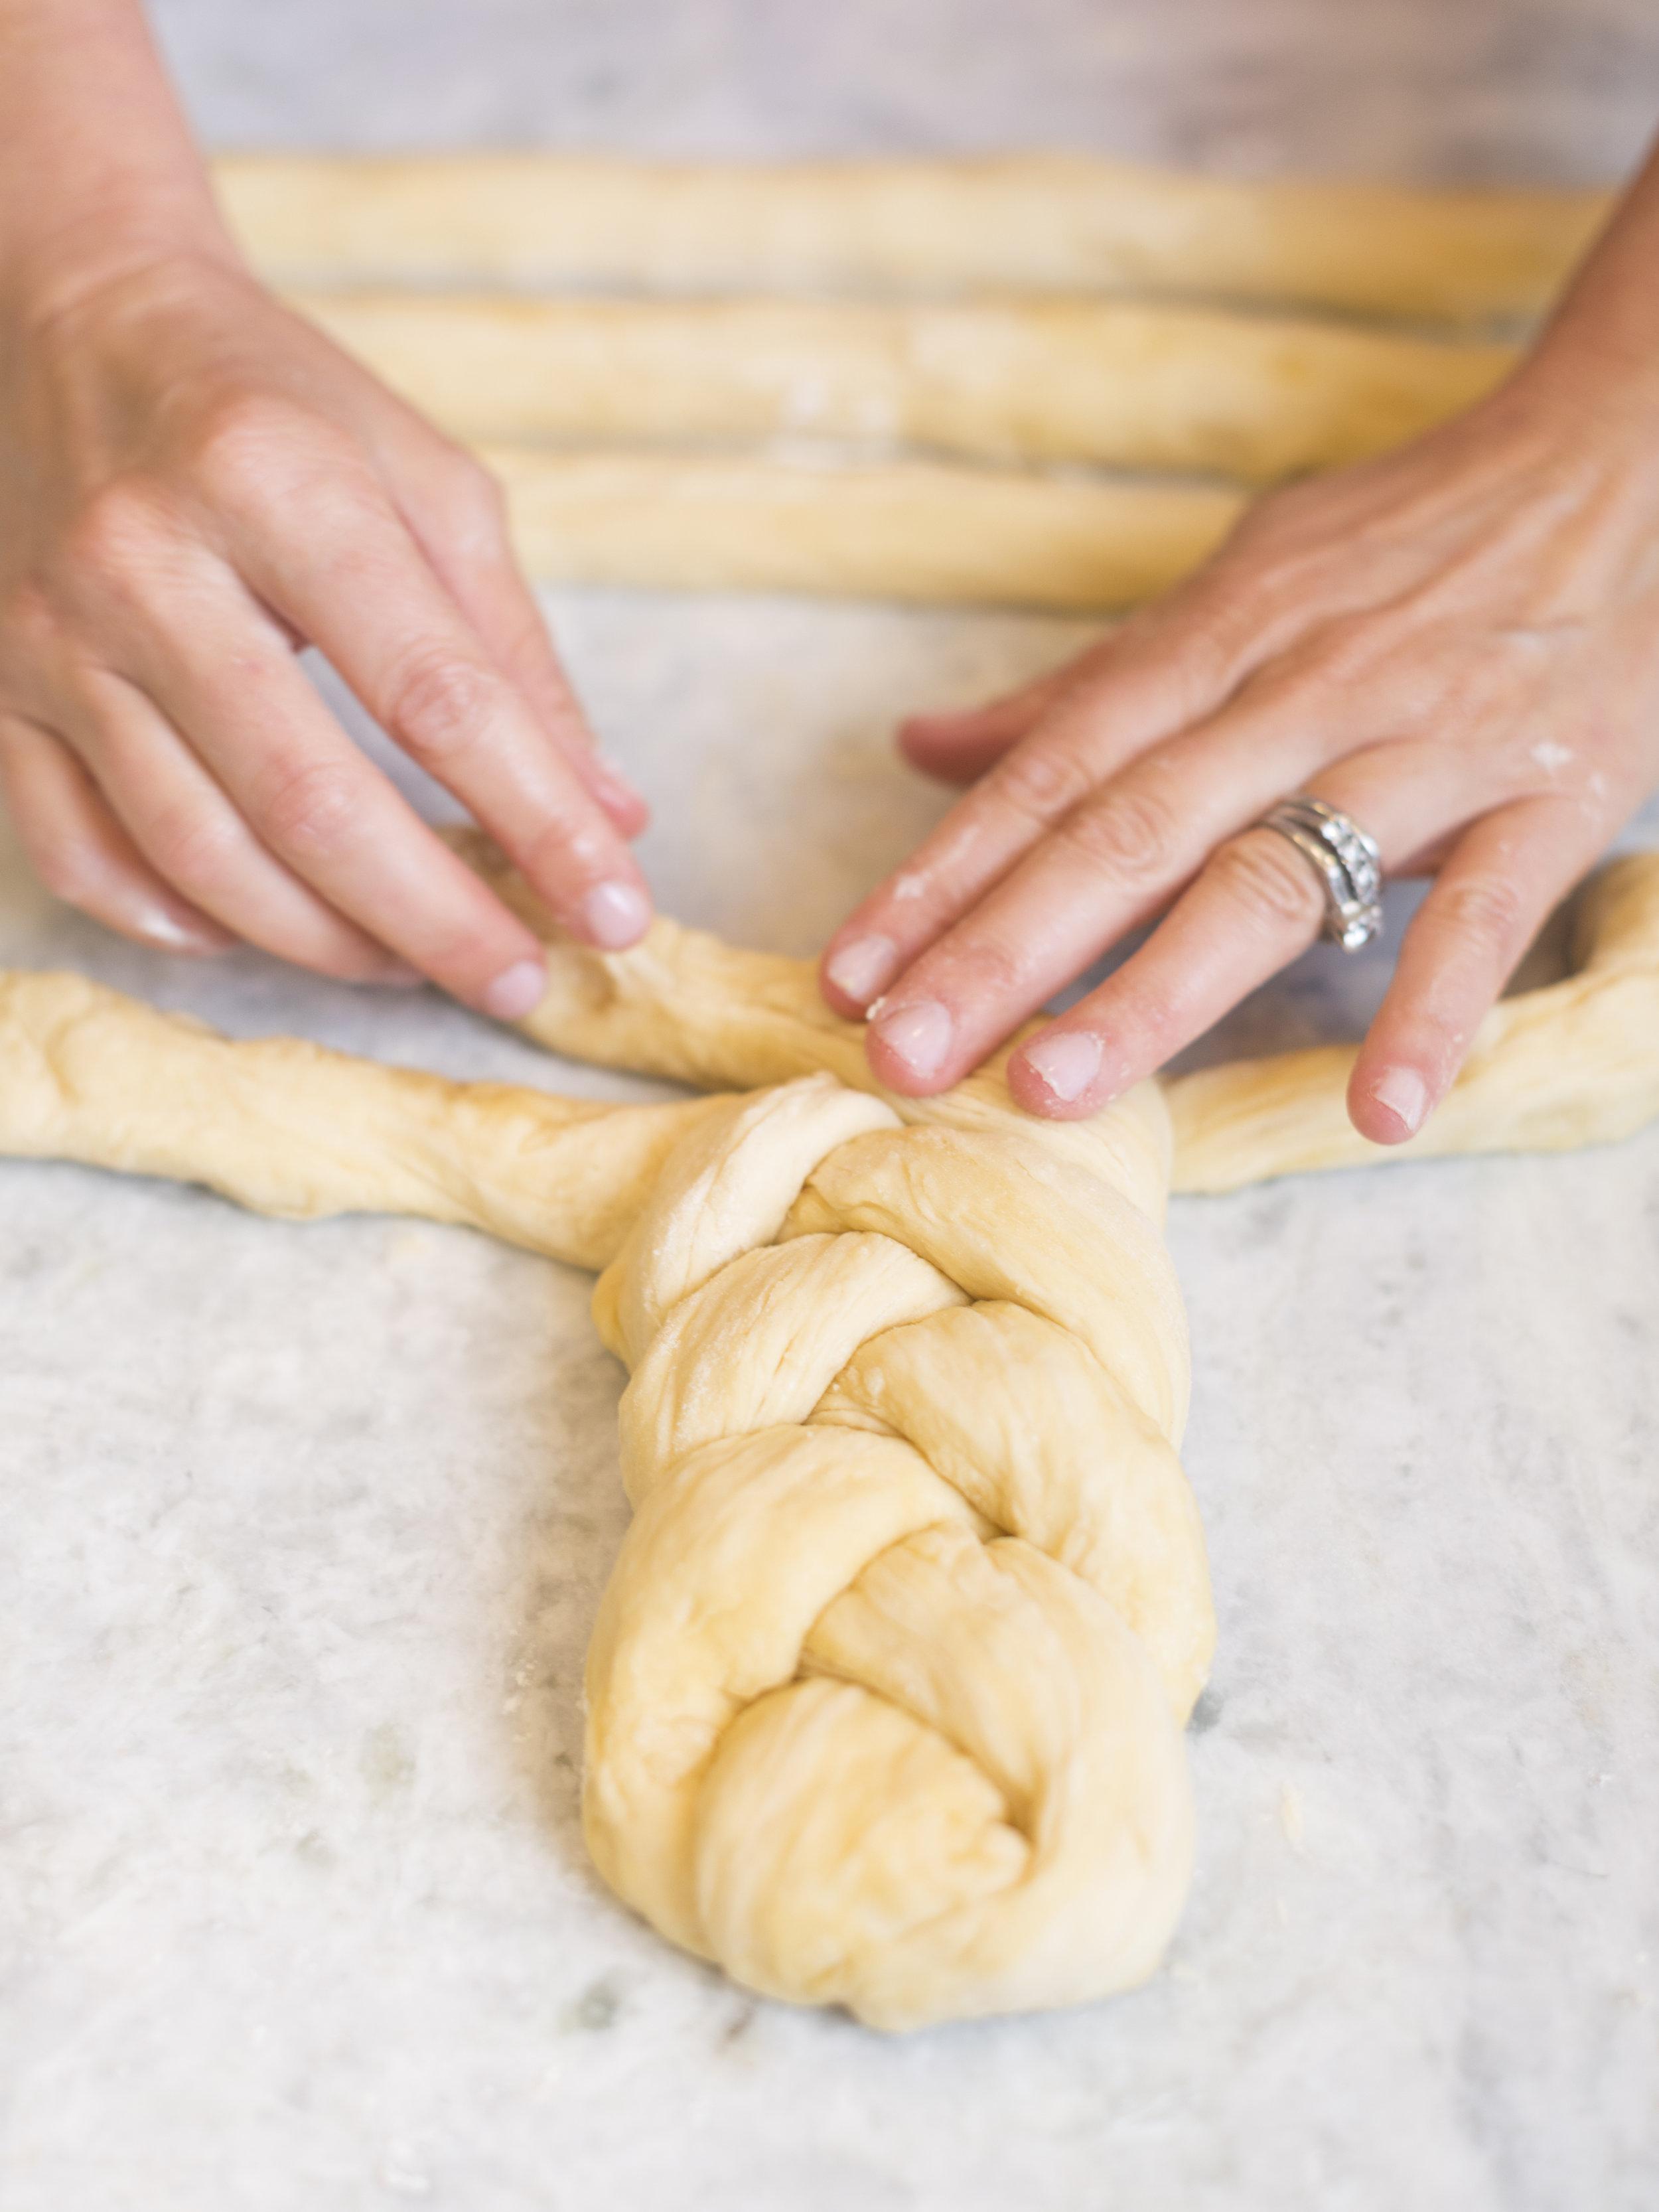 Braiding-challah-dough.JPG